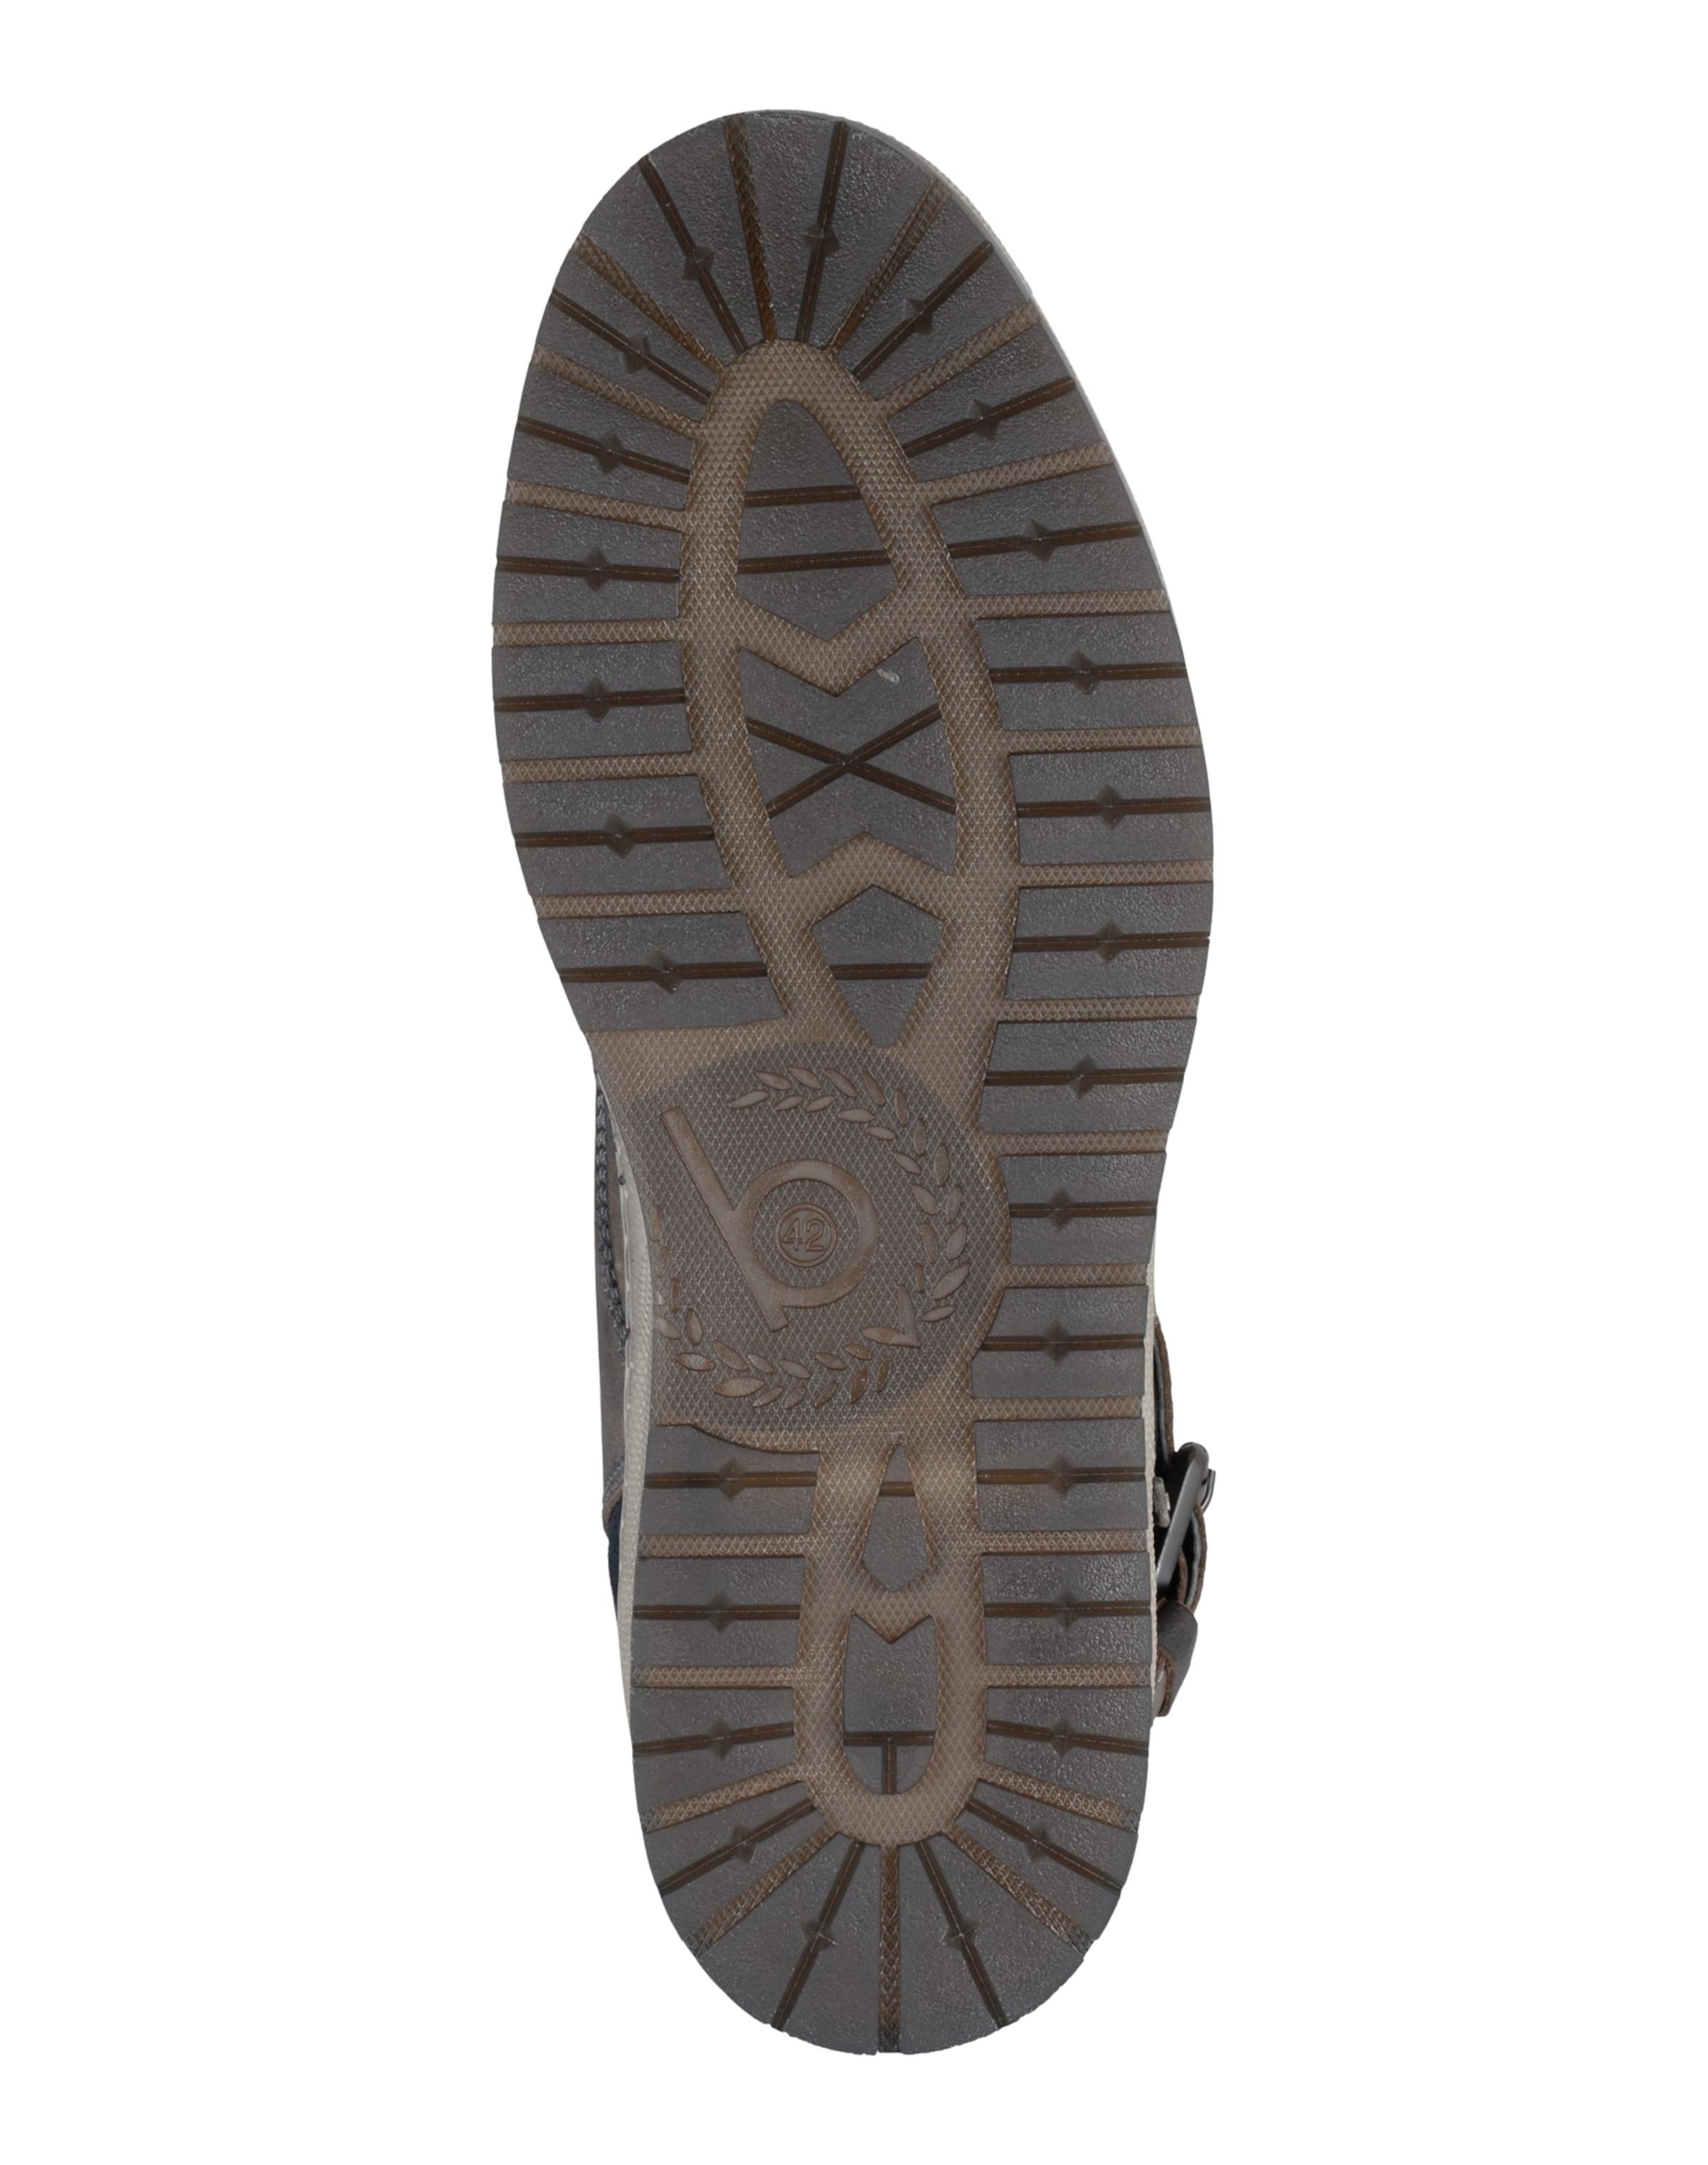 Grau Bugatti Schnalle Sneaker Mit In 34Rj5ALq